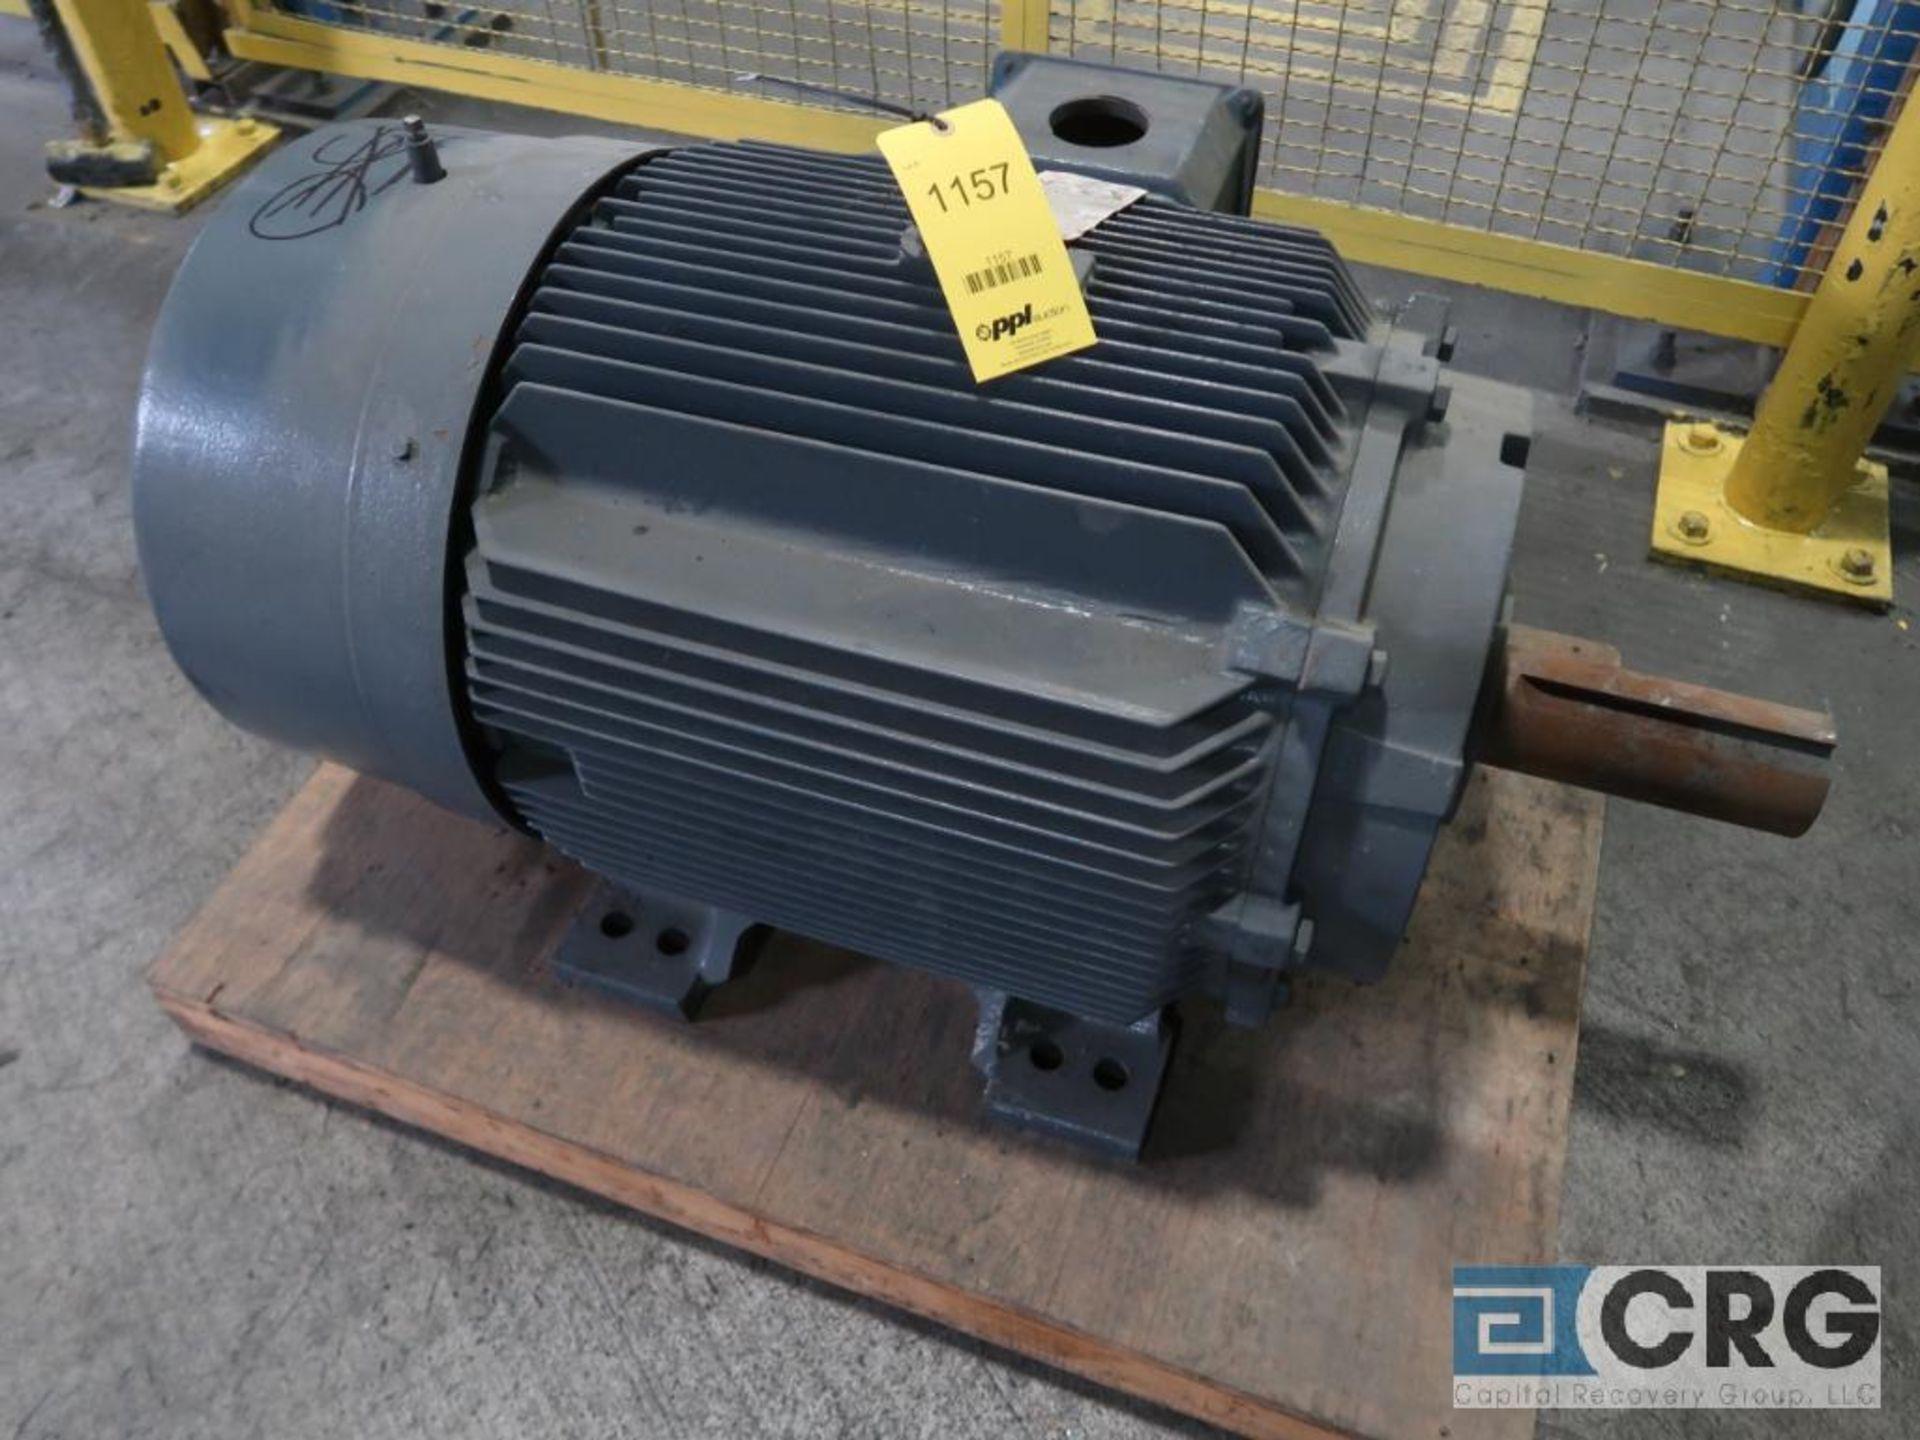 Siemens Premium Efficiency 21 PLUS motor, 125 HP, 1,785 RPMs, 460 volt, 3 ph., 444T frame (Finish